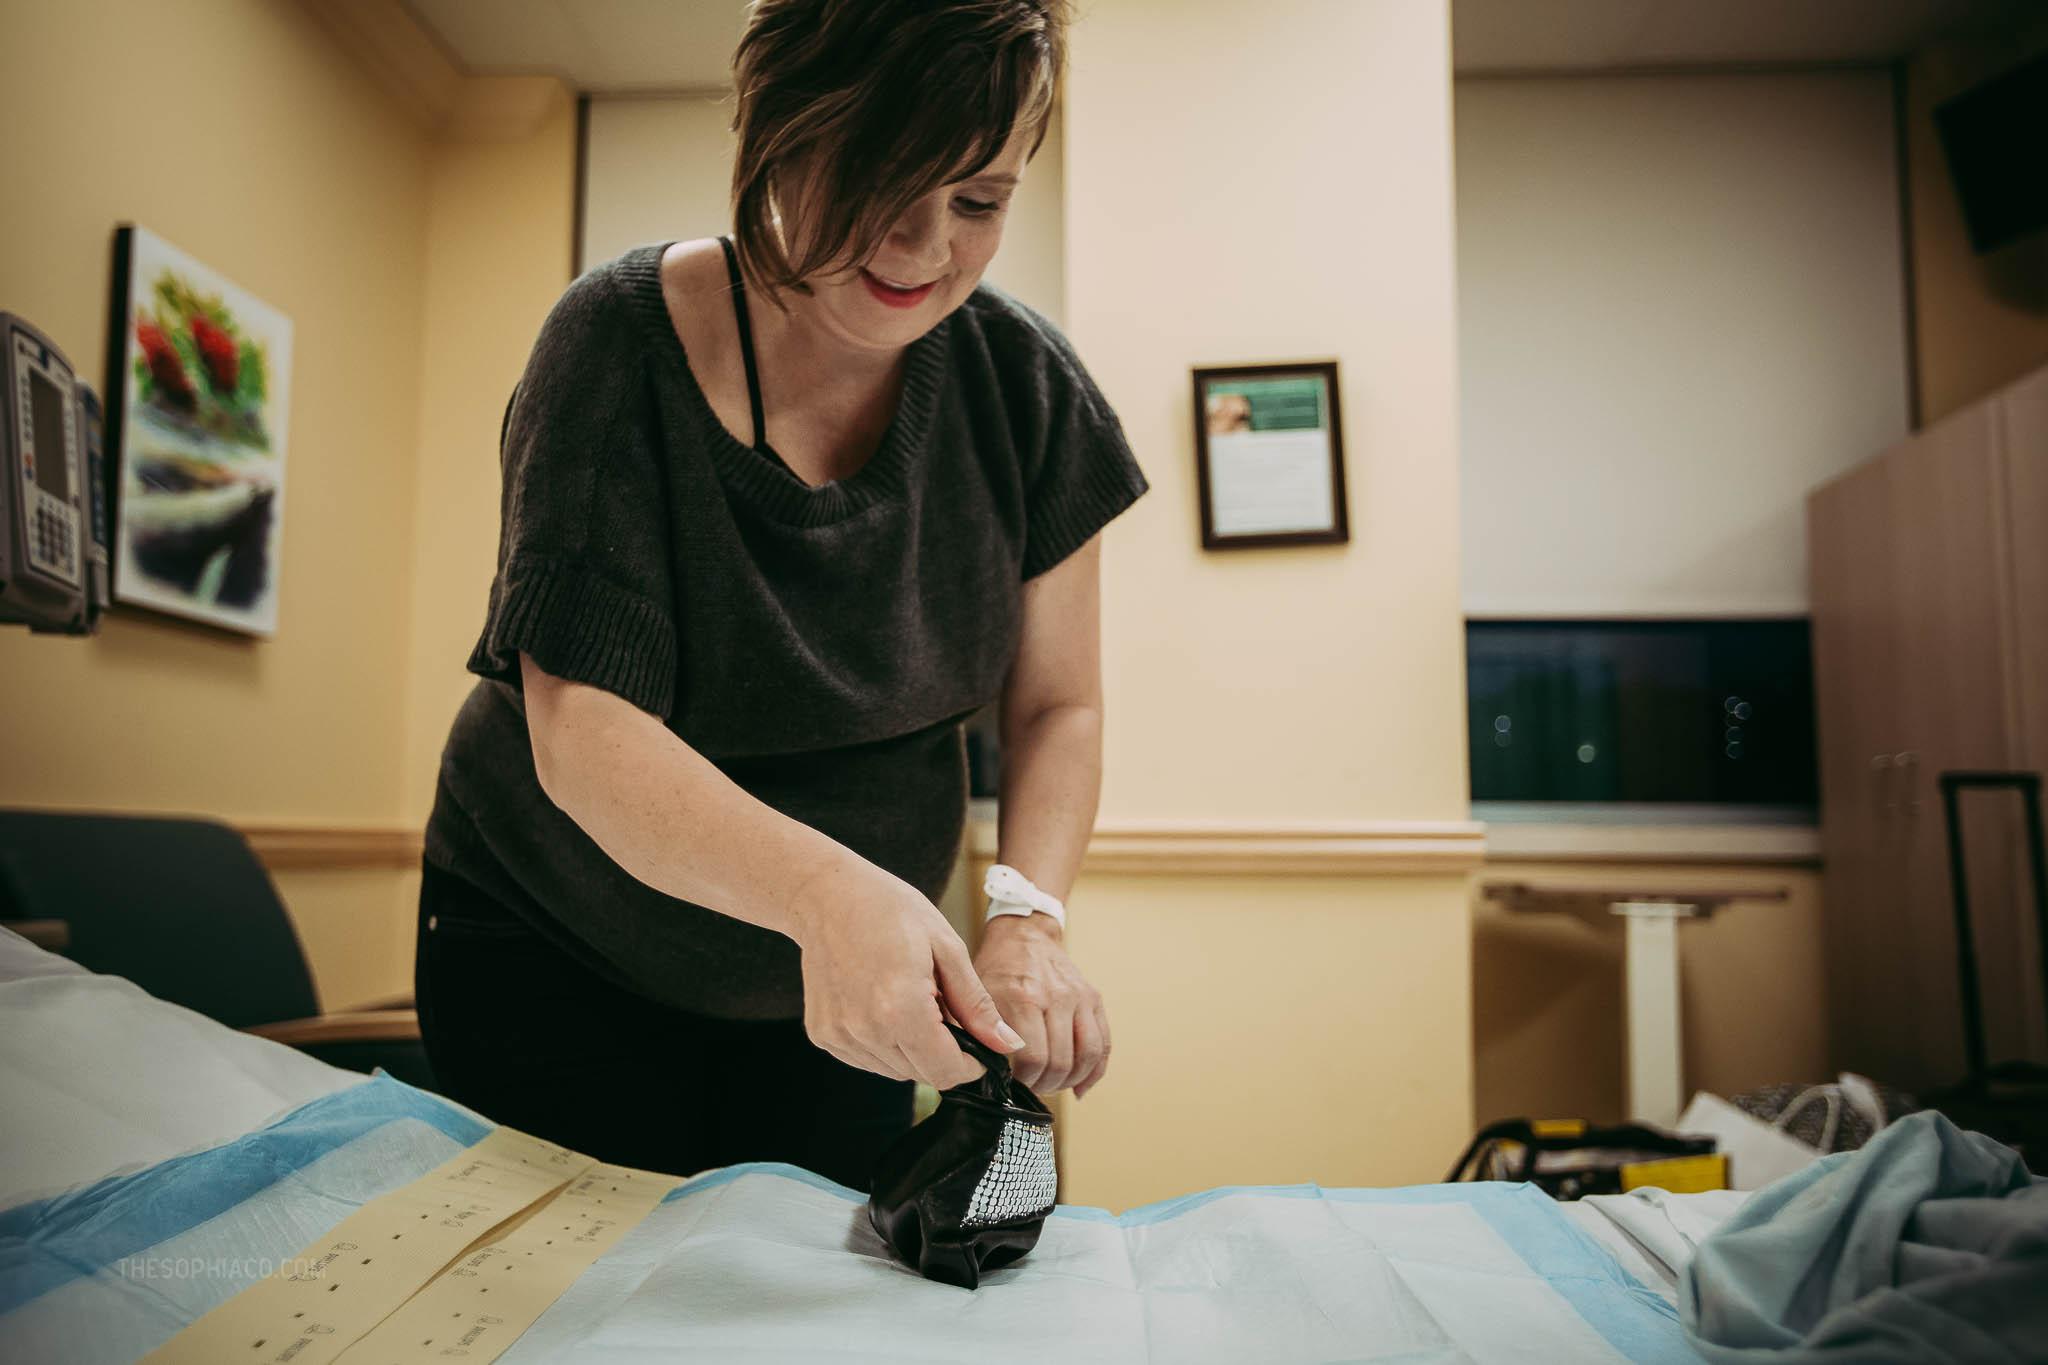 Oahu-Birth-Photographer-scheduled-cesarean-kaiser-04.jpg